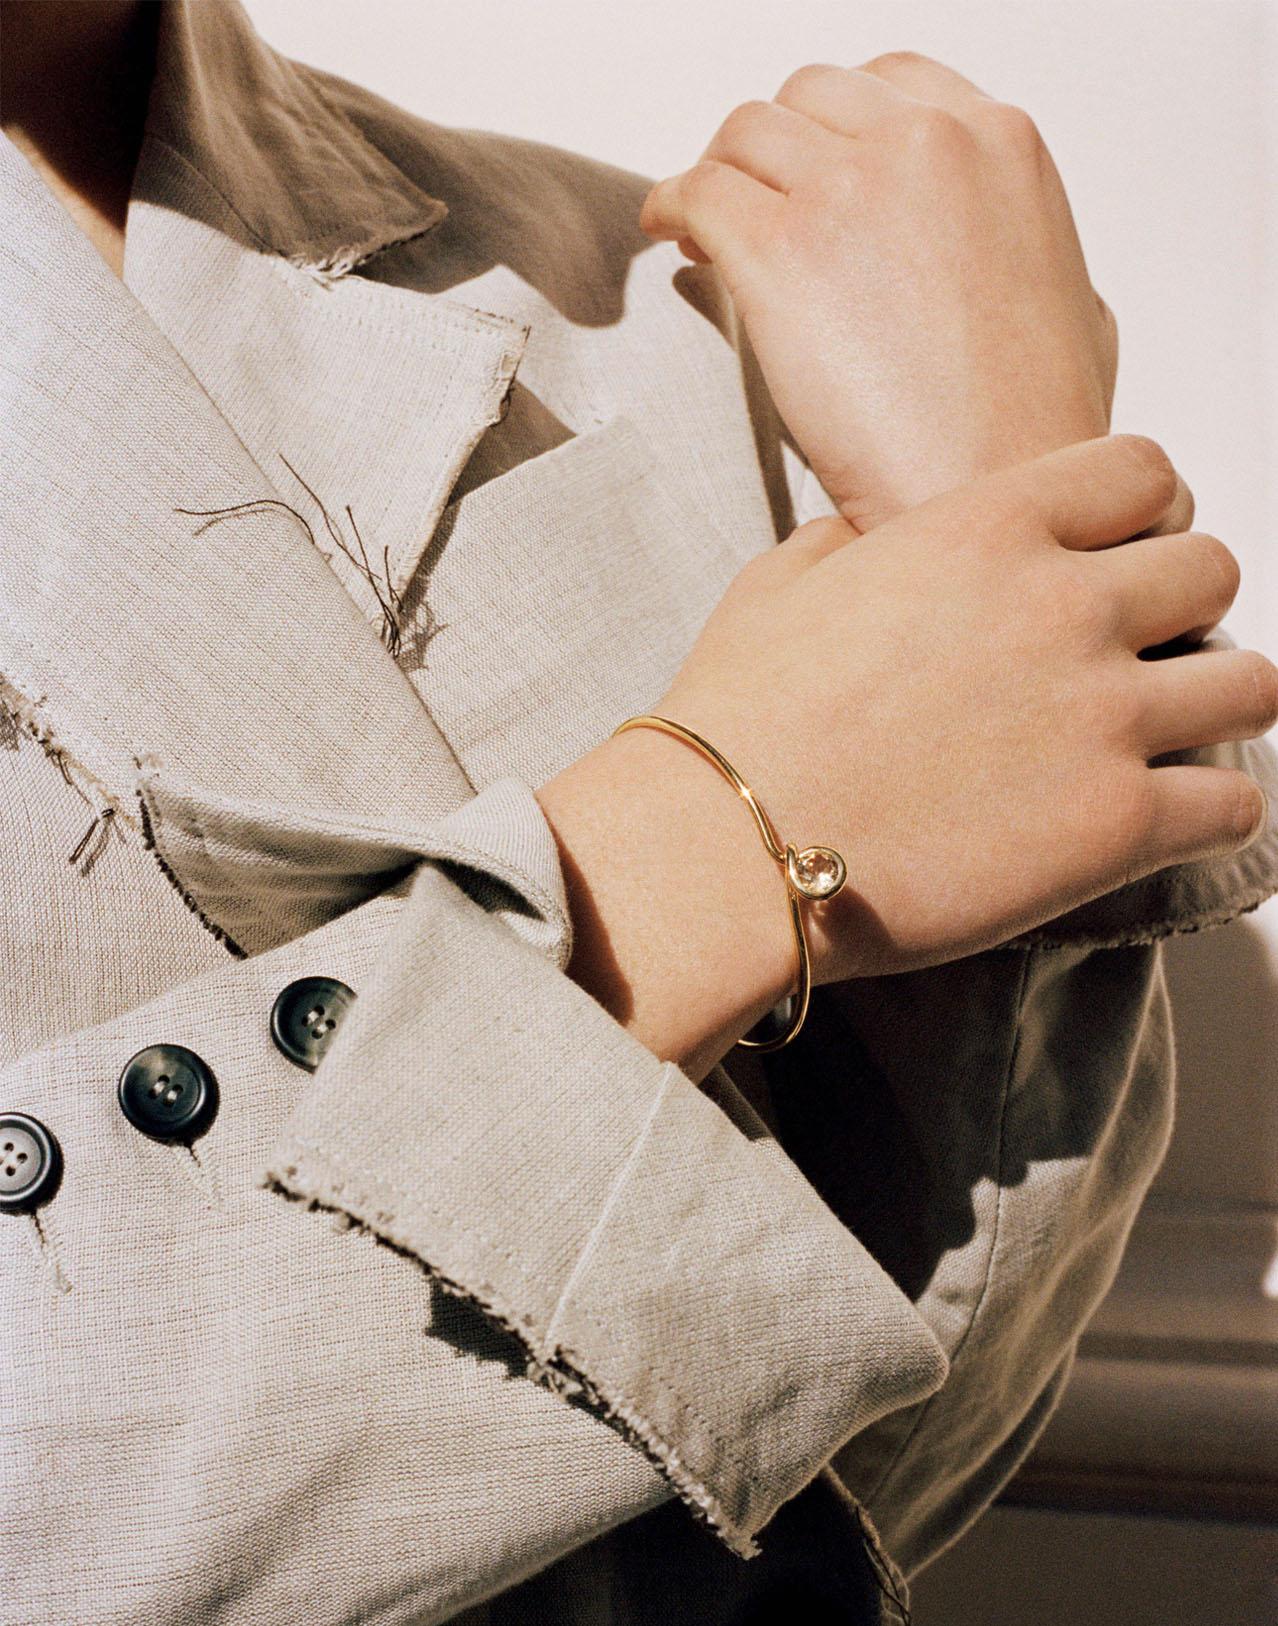 Completedworks_Gold Vermeil_Jewellery_Tied_011.jpg